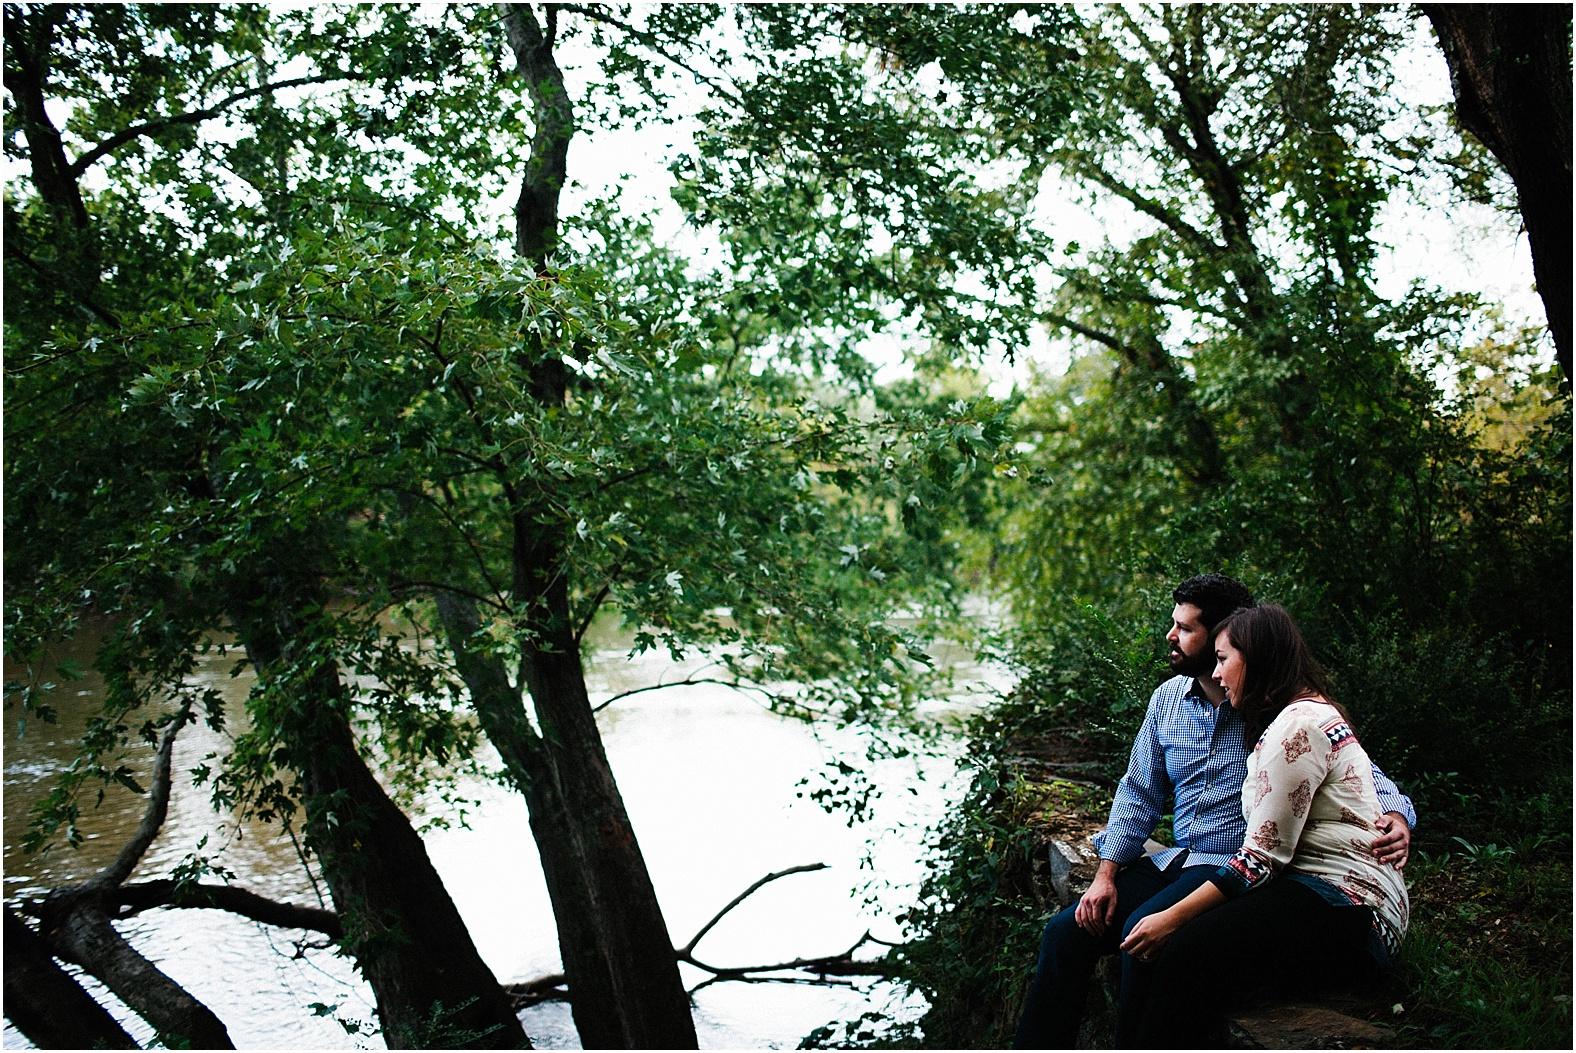 manzanita photo by rebecca caridad internation wedding photogrpaher, colorado wedding photographer, nashville wedding photographer_0469.jpg